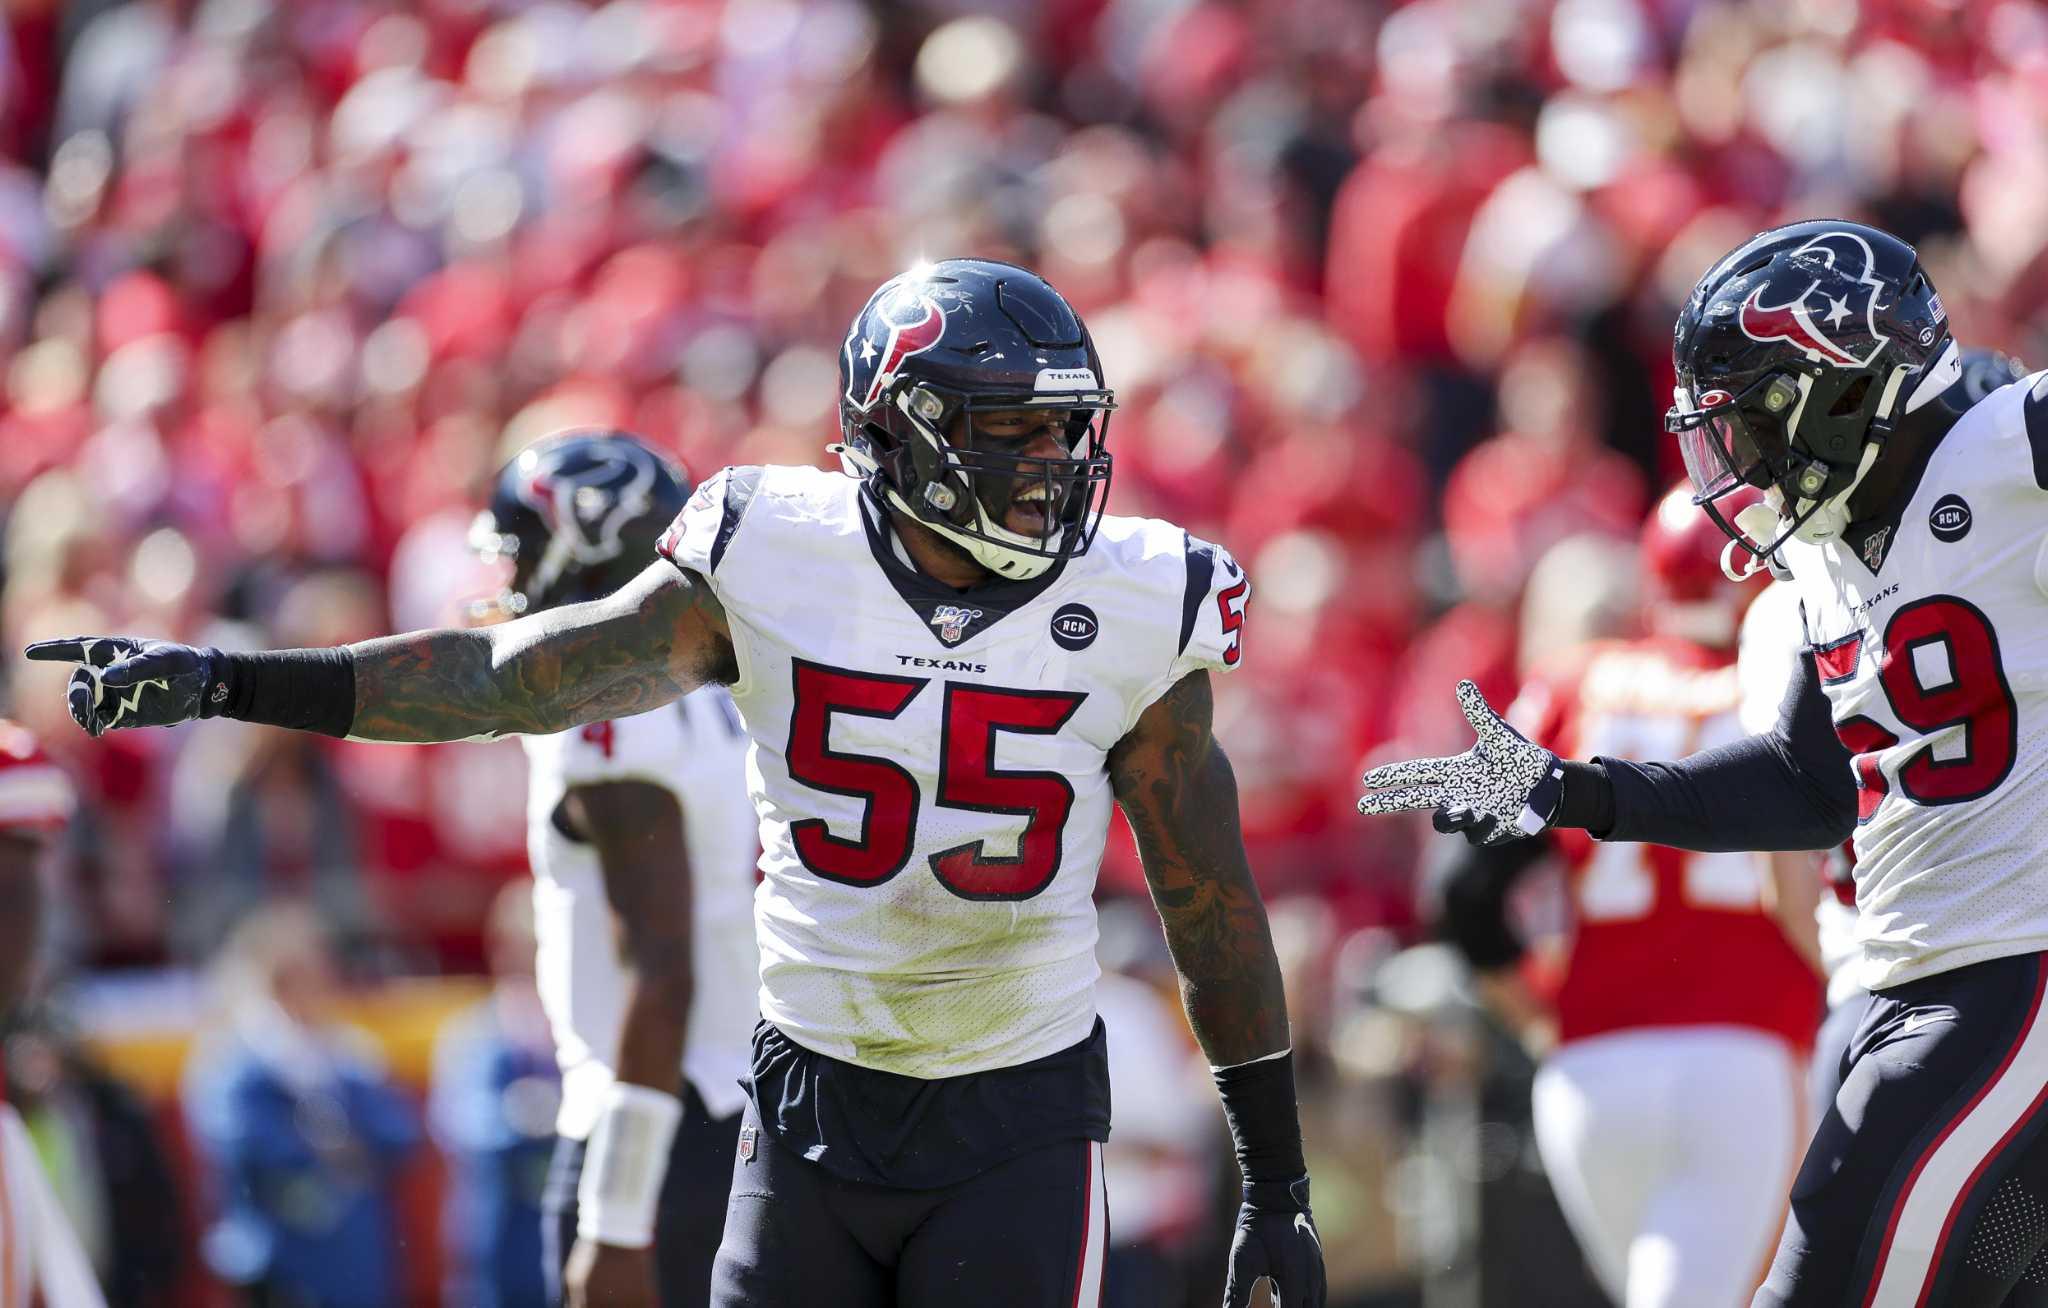 The 'heartbeat' of the Texans defense: Benardrick McKinney